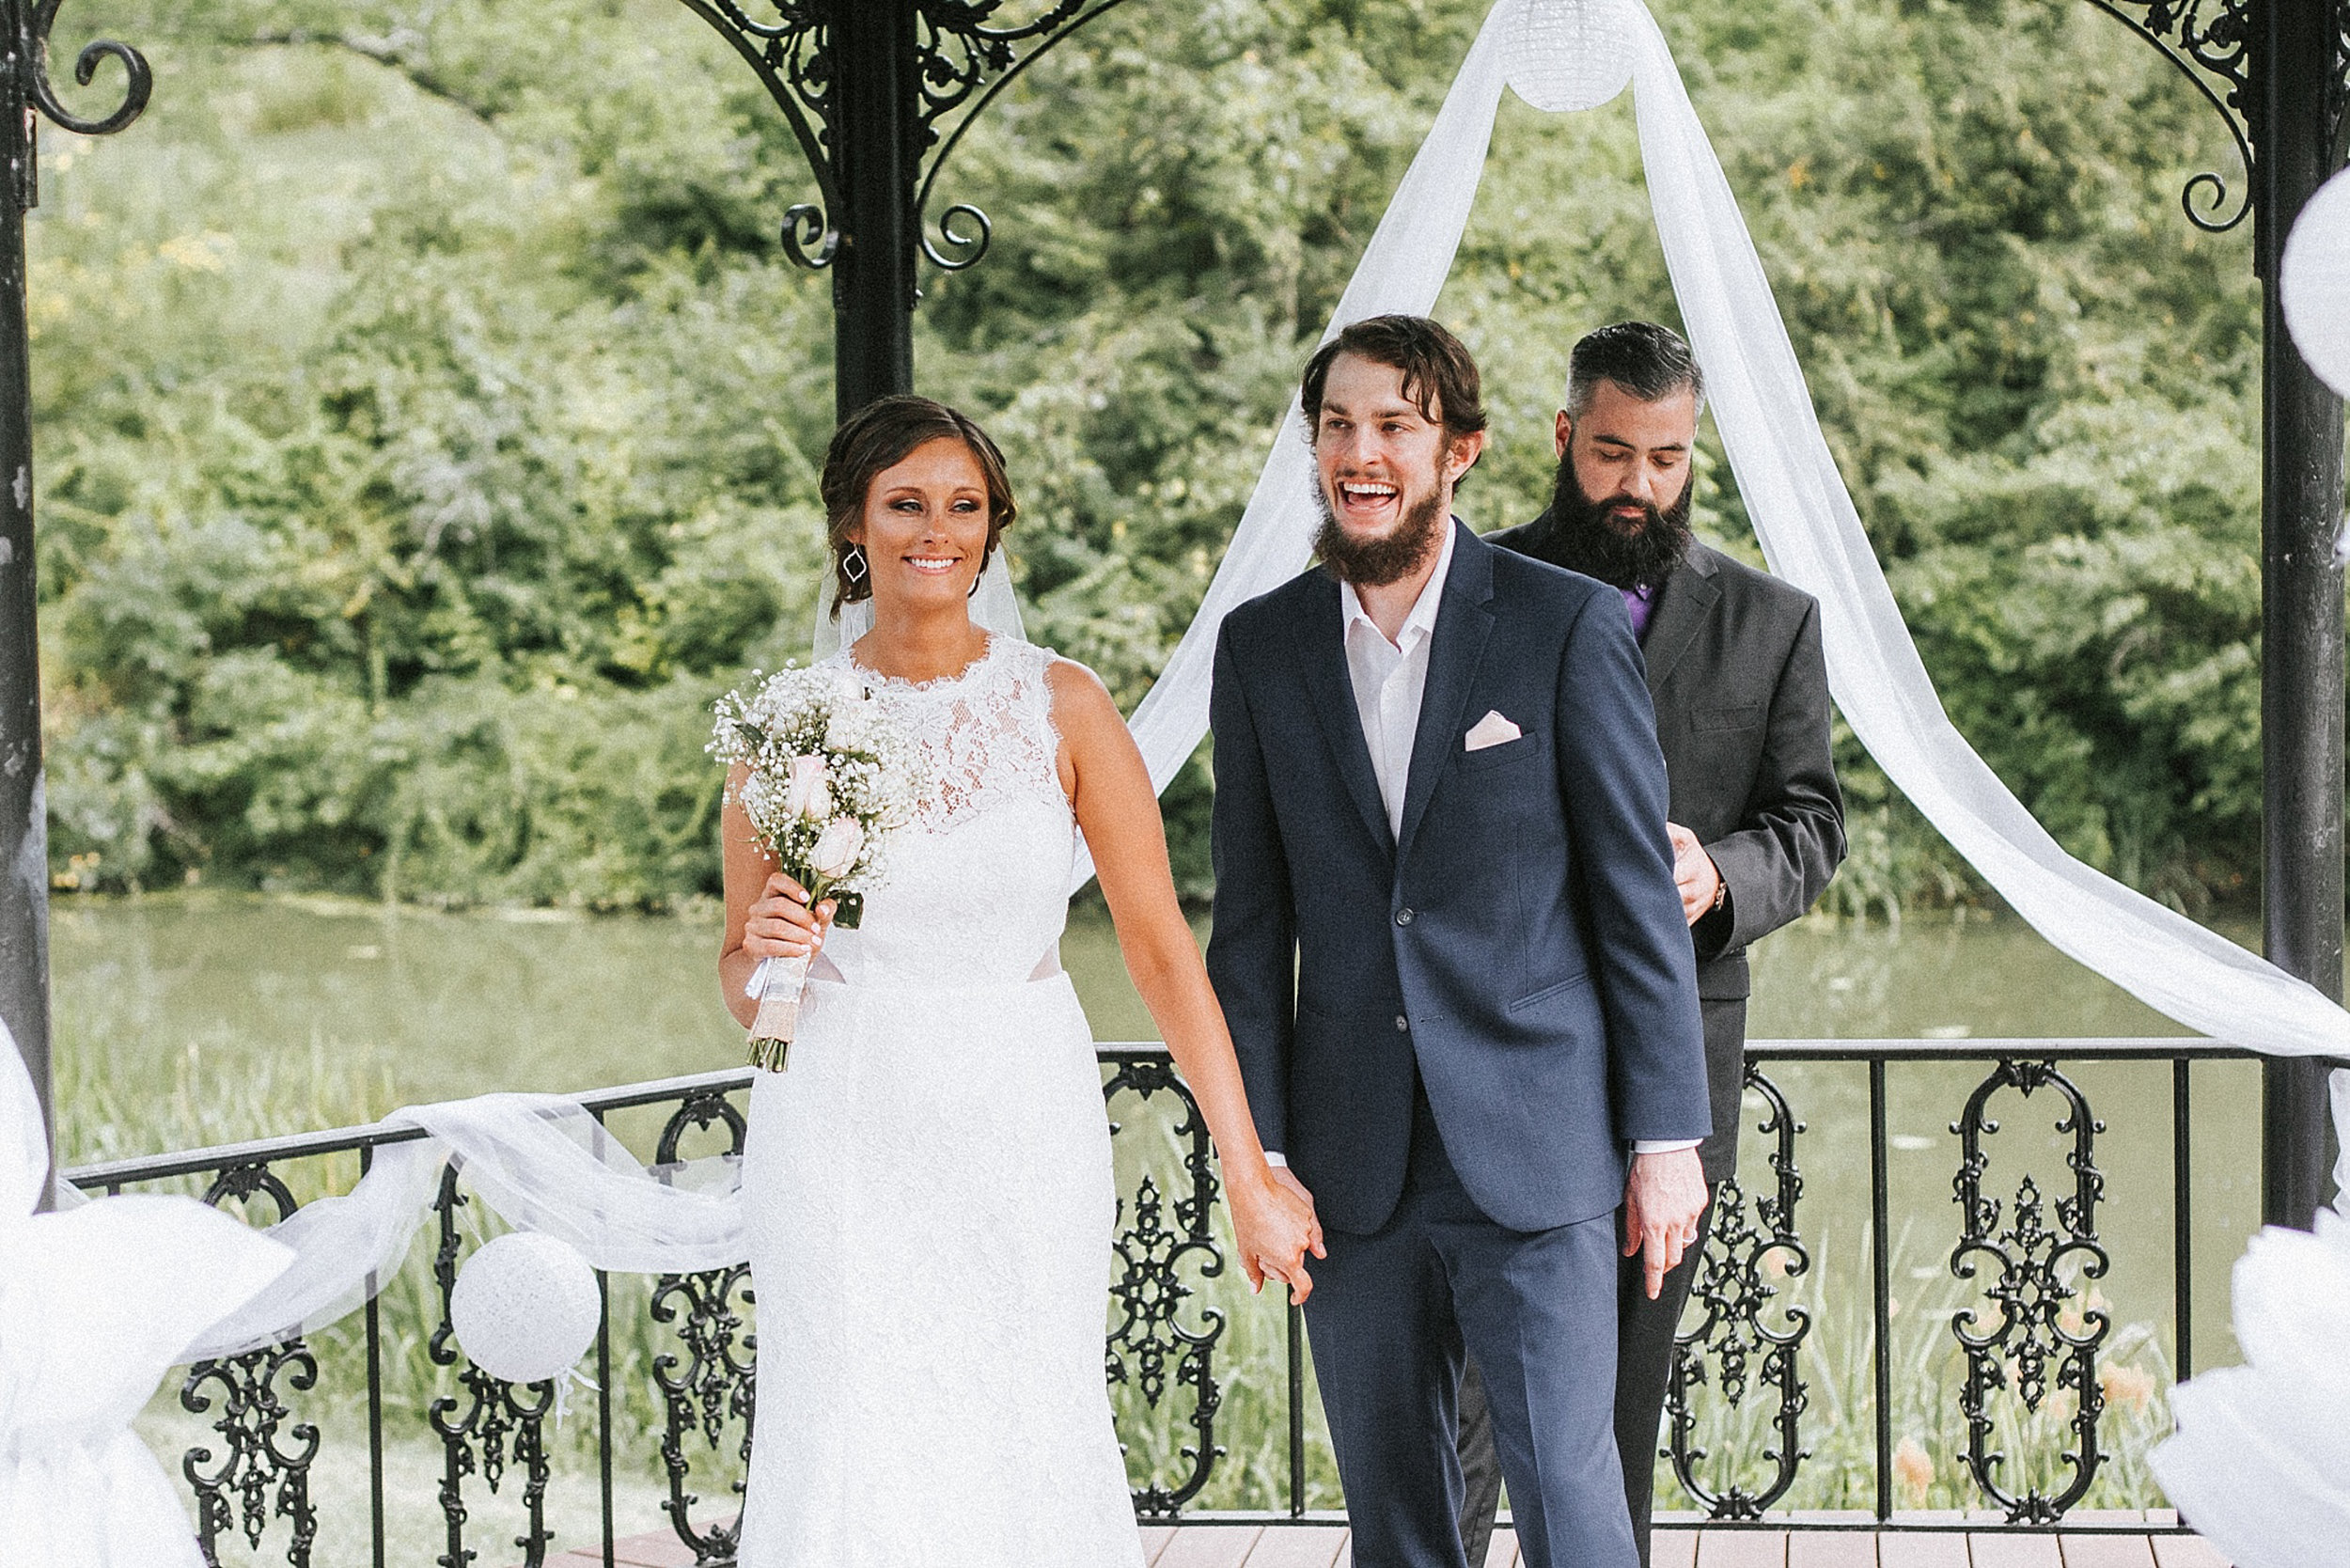 Brooke Townsend Photography - Ohio Wedding Photographer (68 of 78).jpg